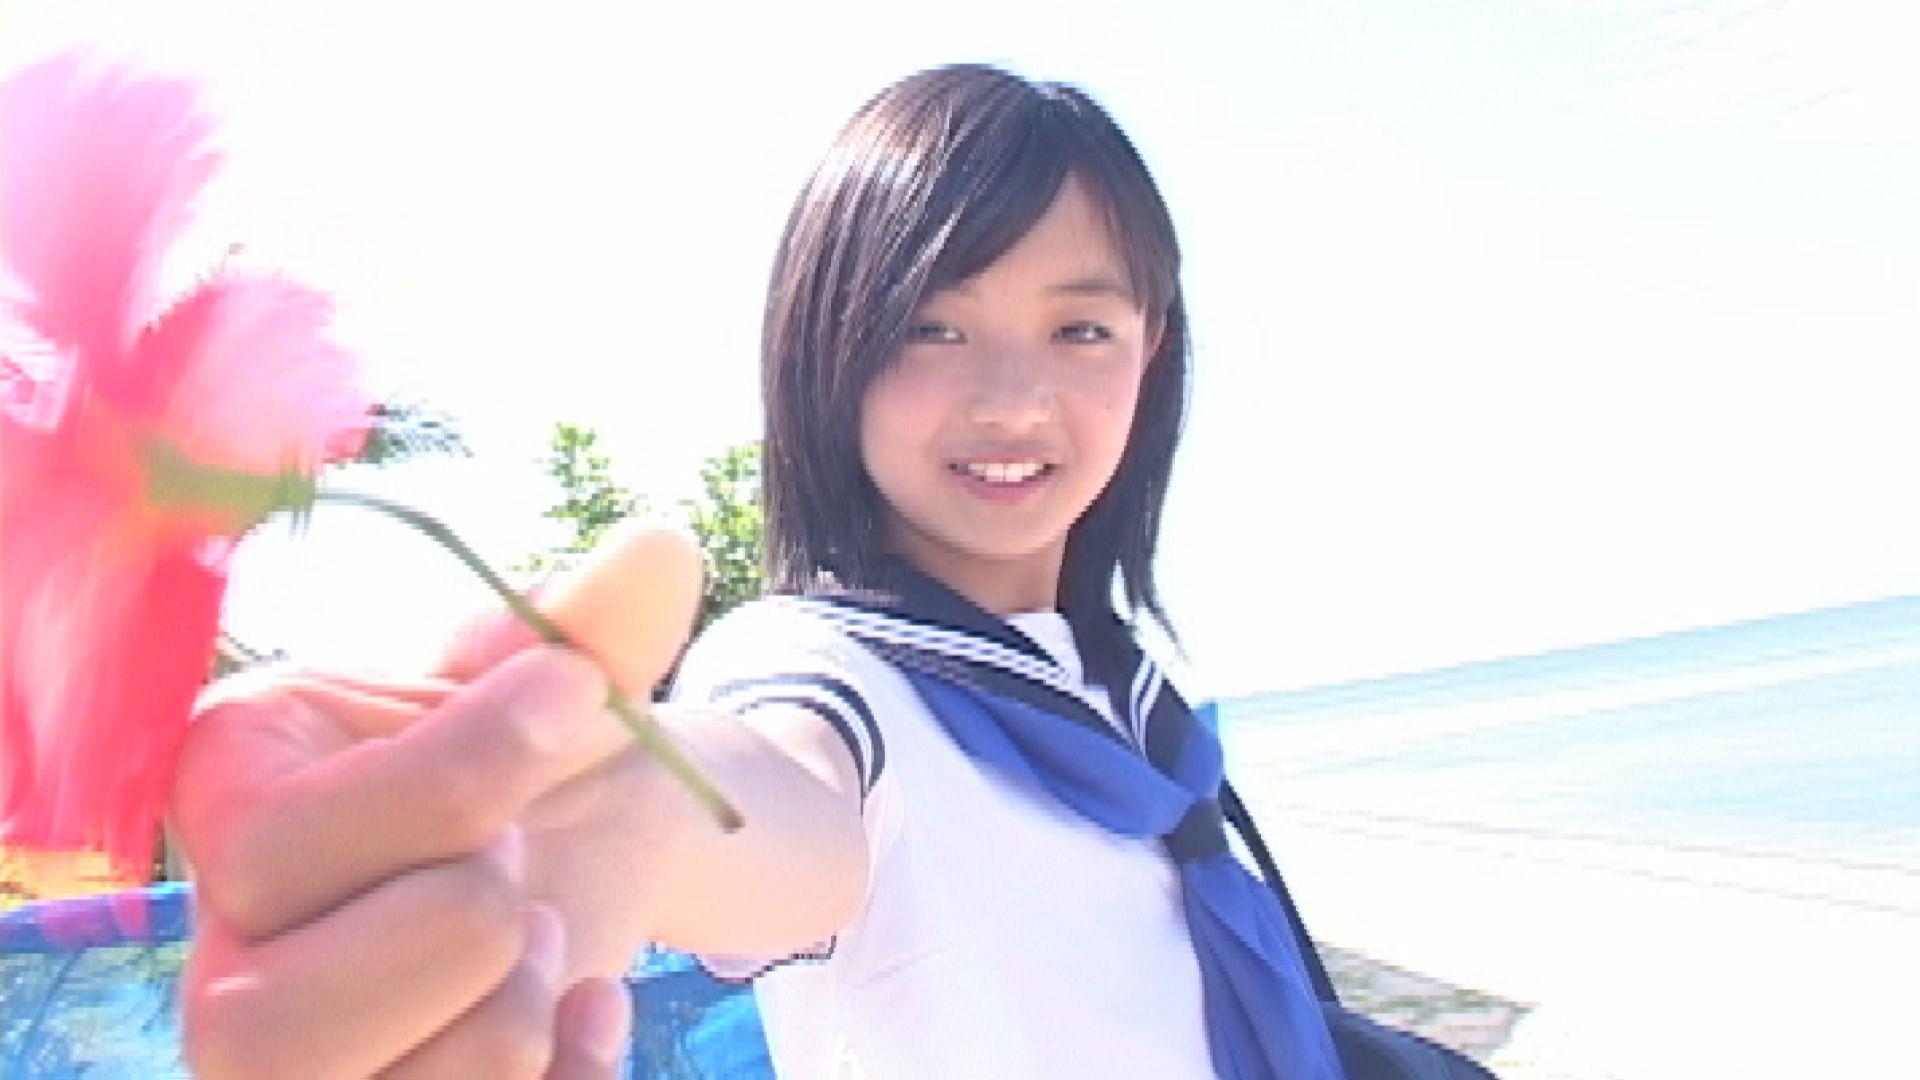 mayumi vol.1 / まゆみ 12